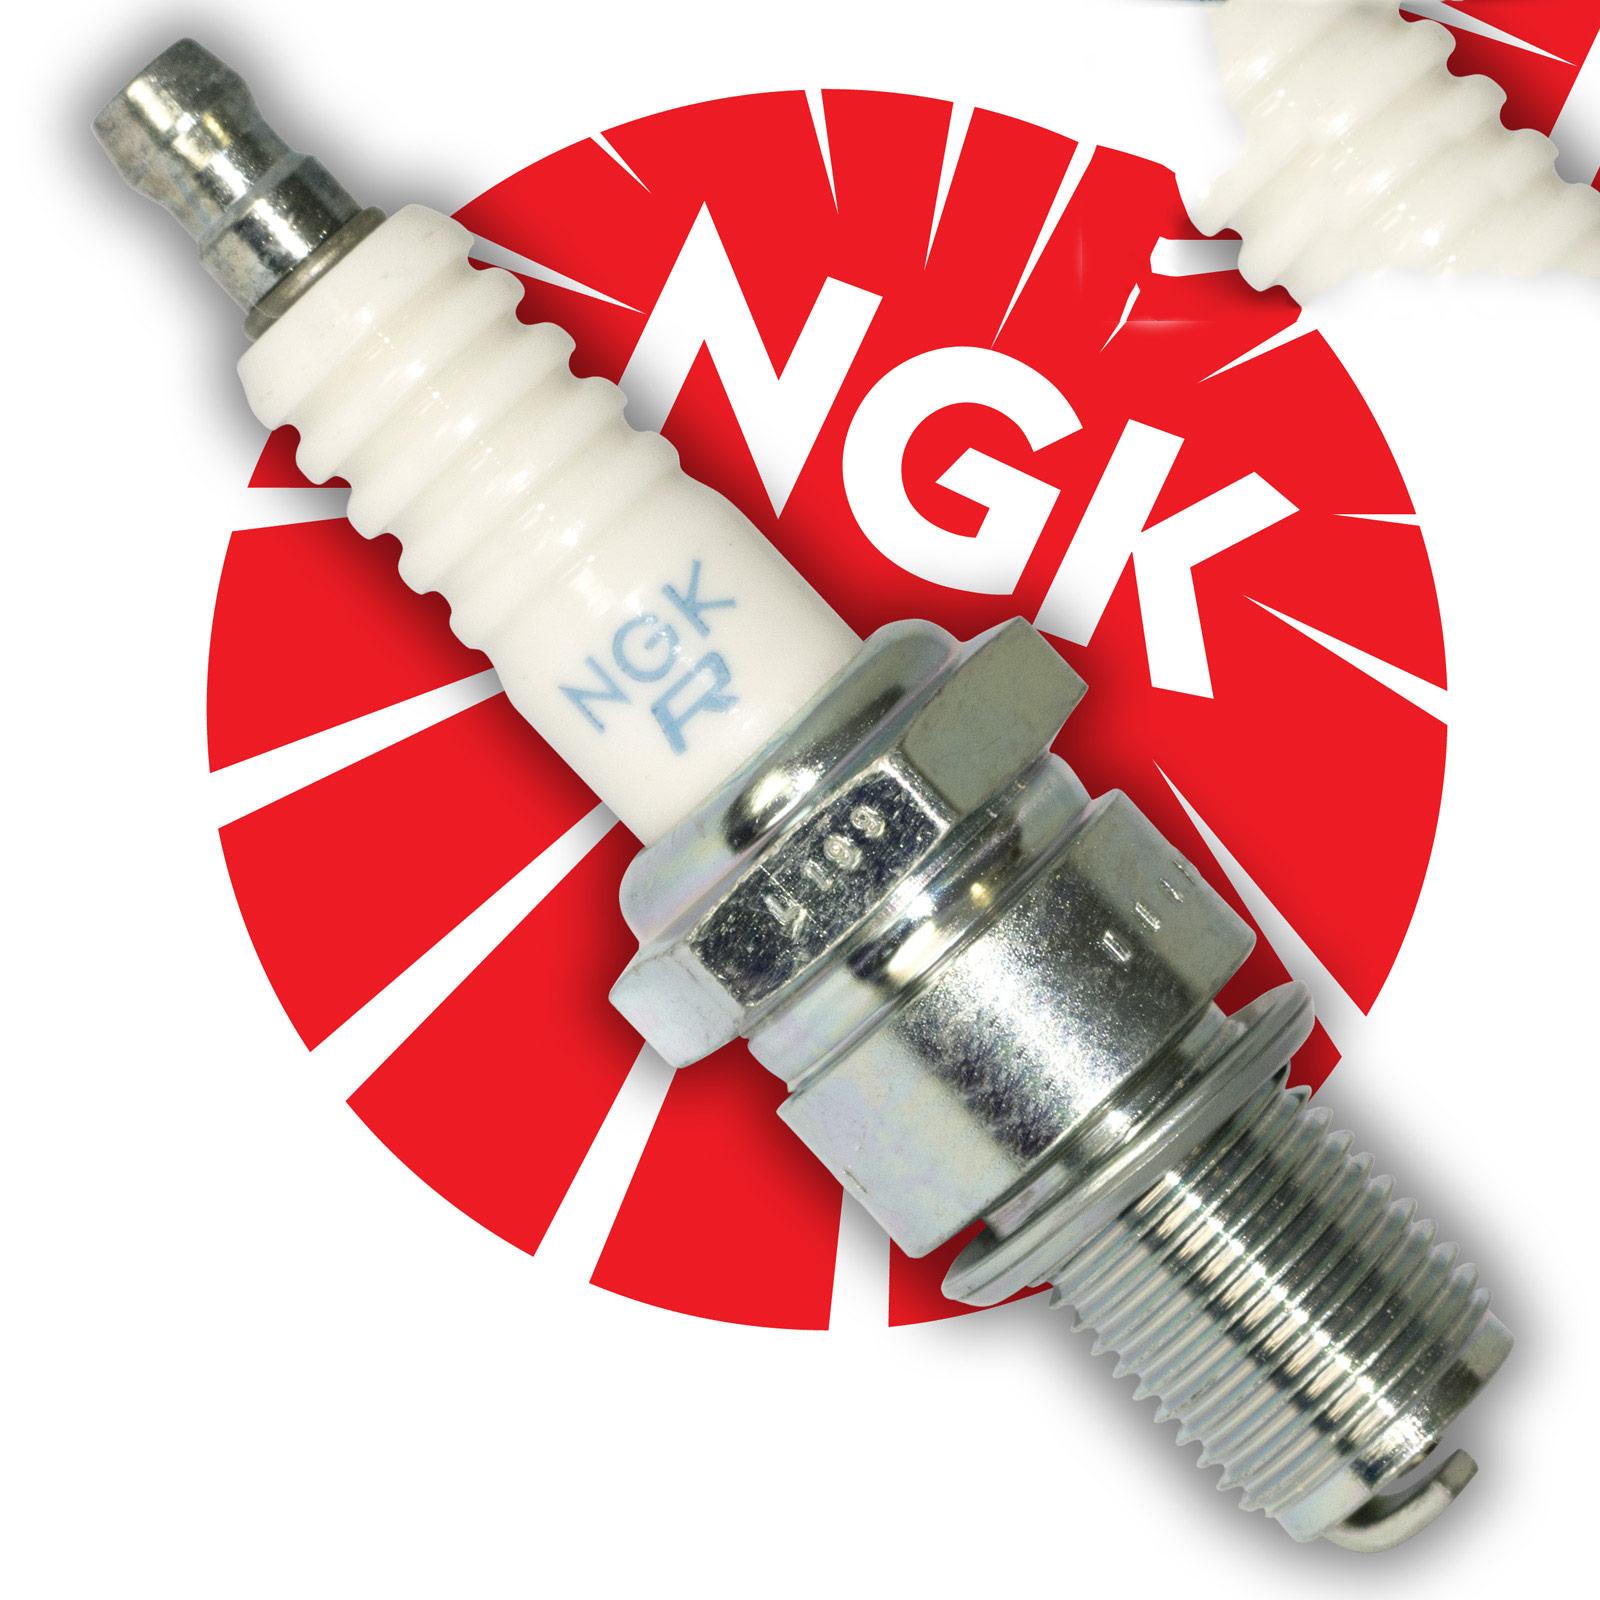 Genuine Ngk Spark Plug Piaggio Vespa Px125e Electric Start 1993 Wiring Diagram